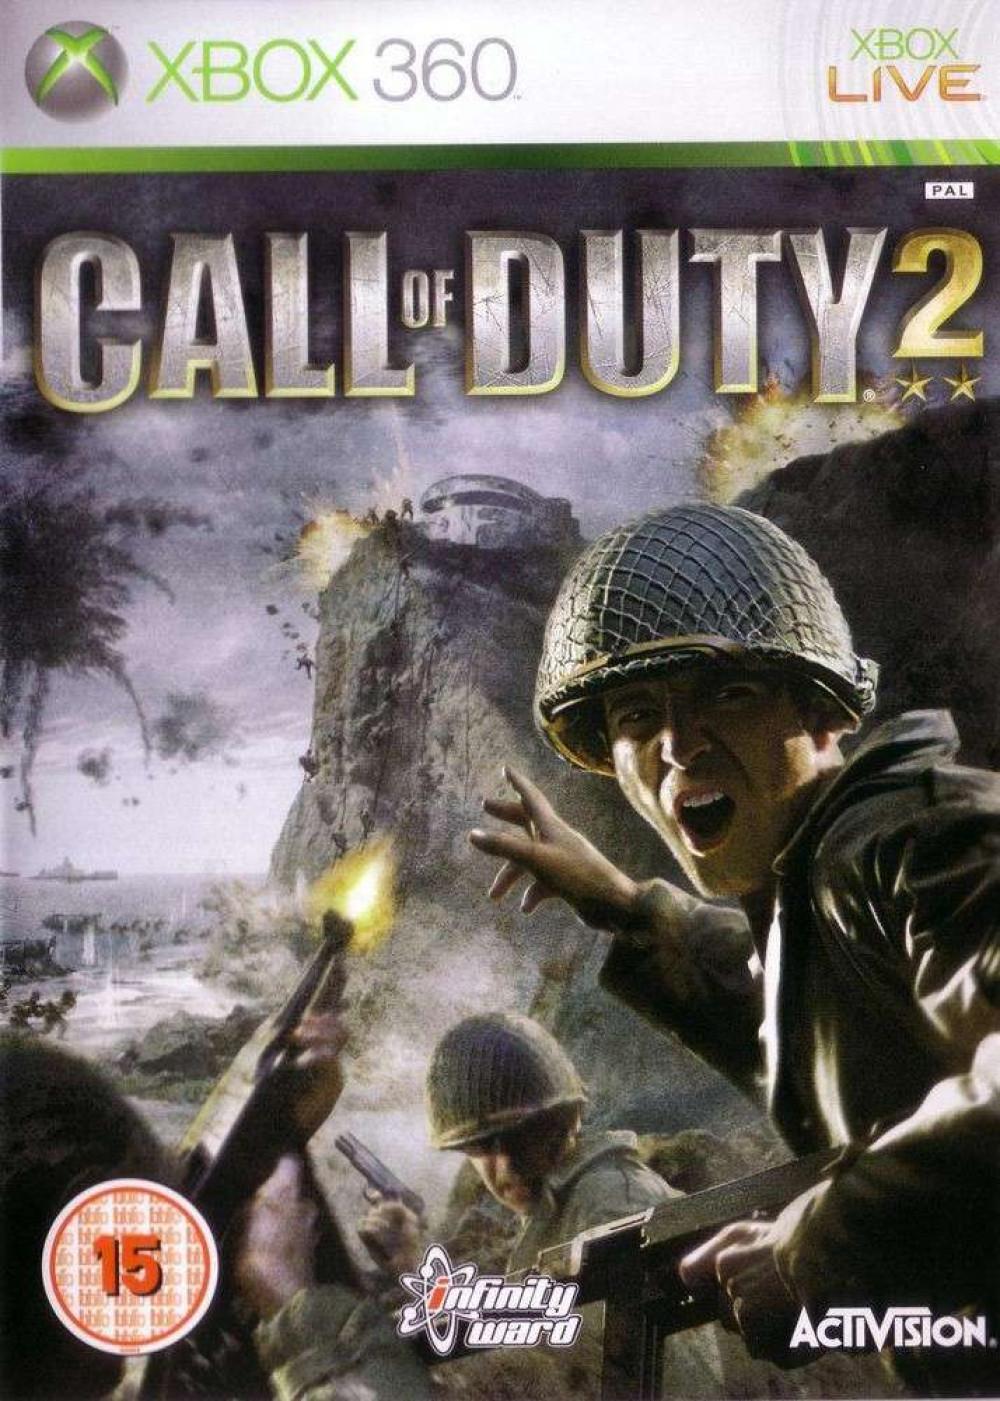 XBOX 360 Call of Duty 2